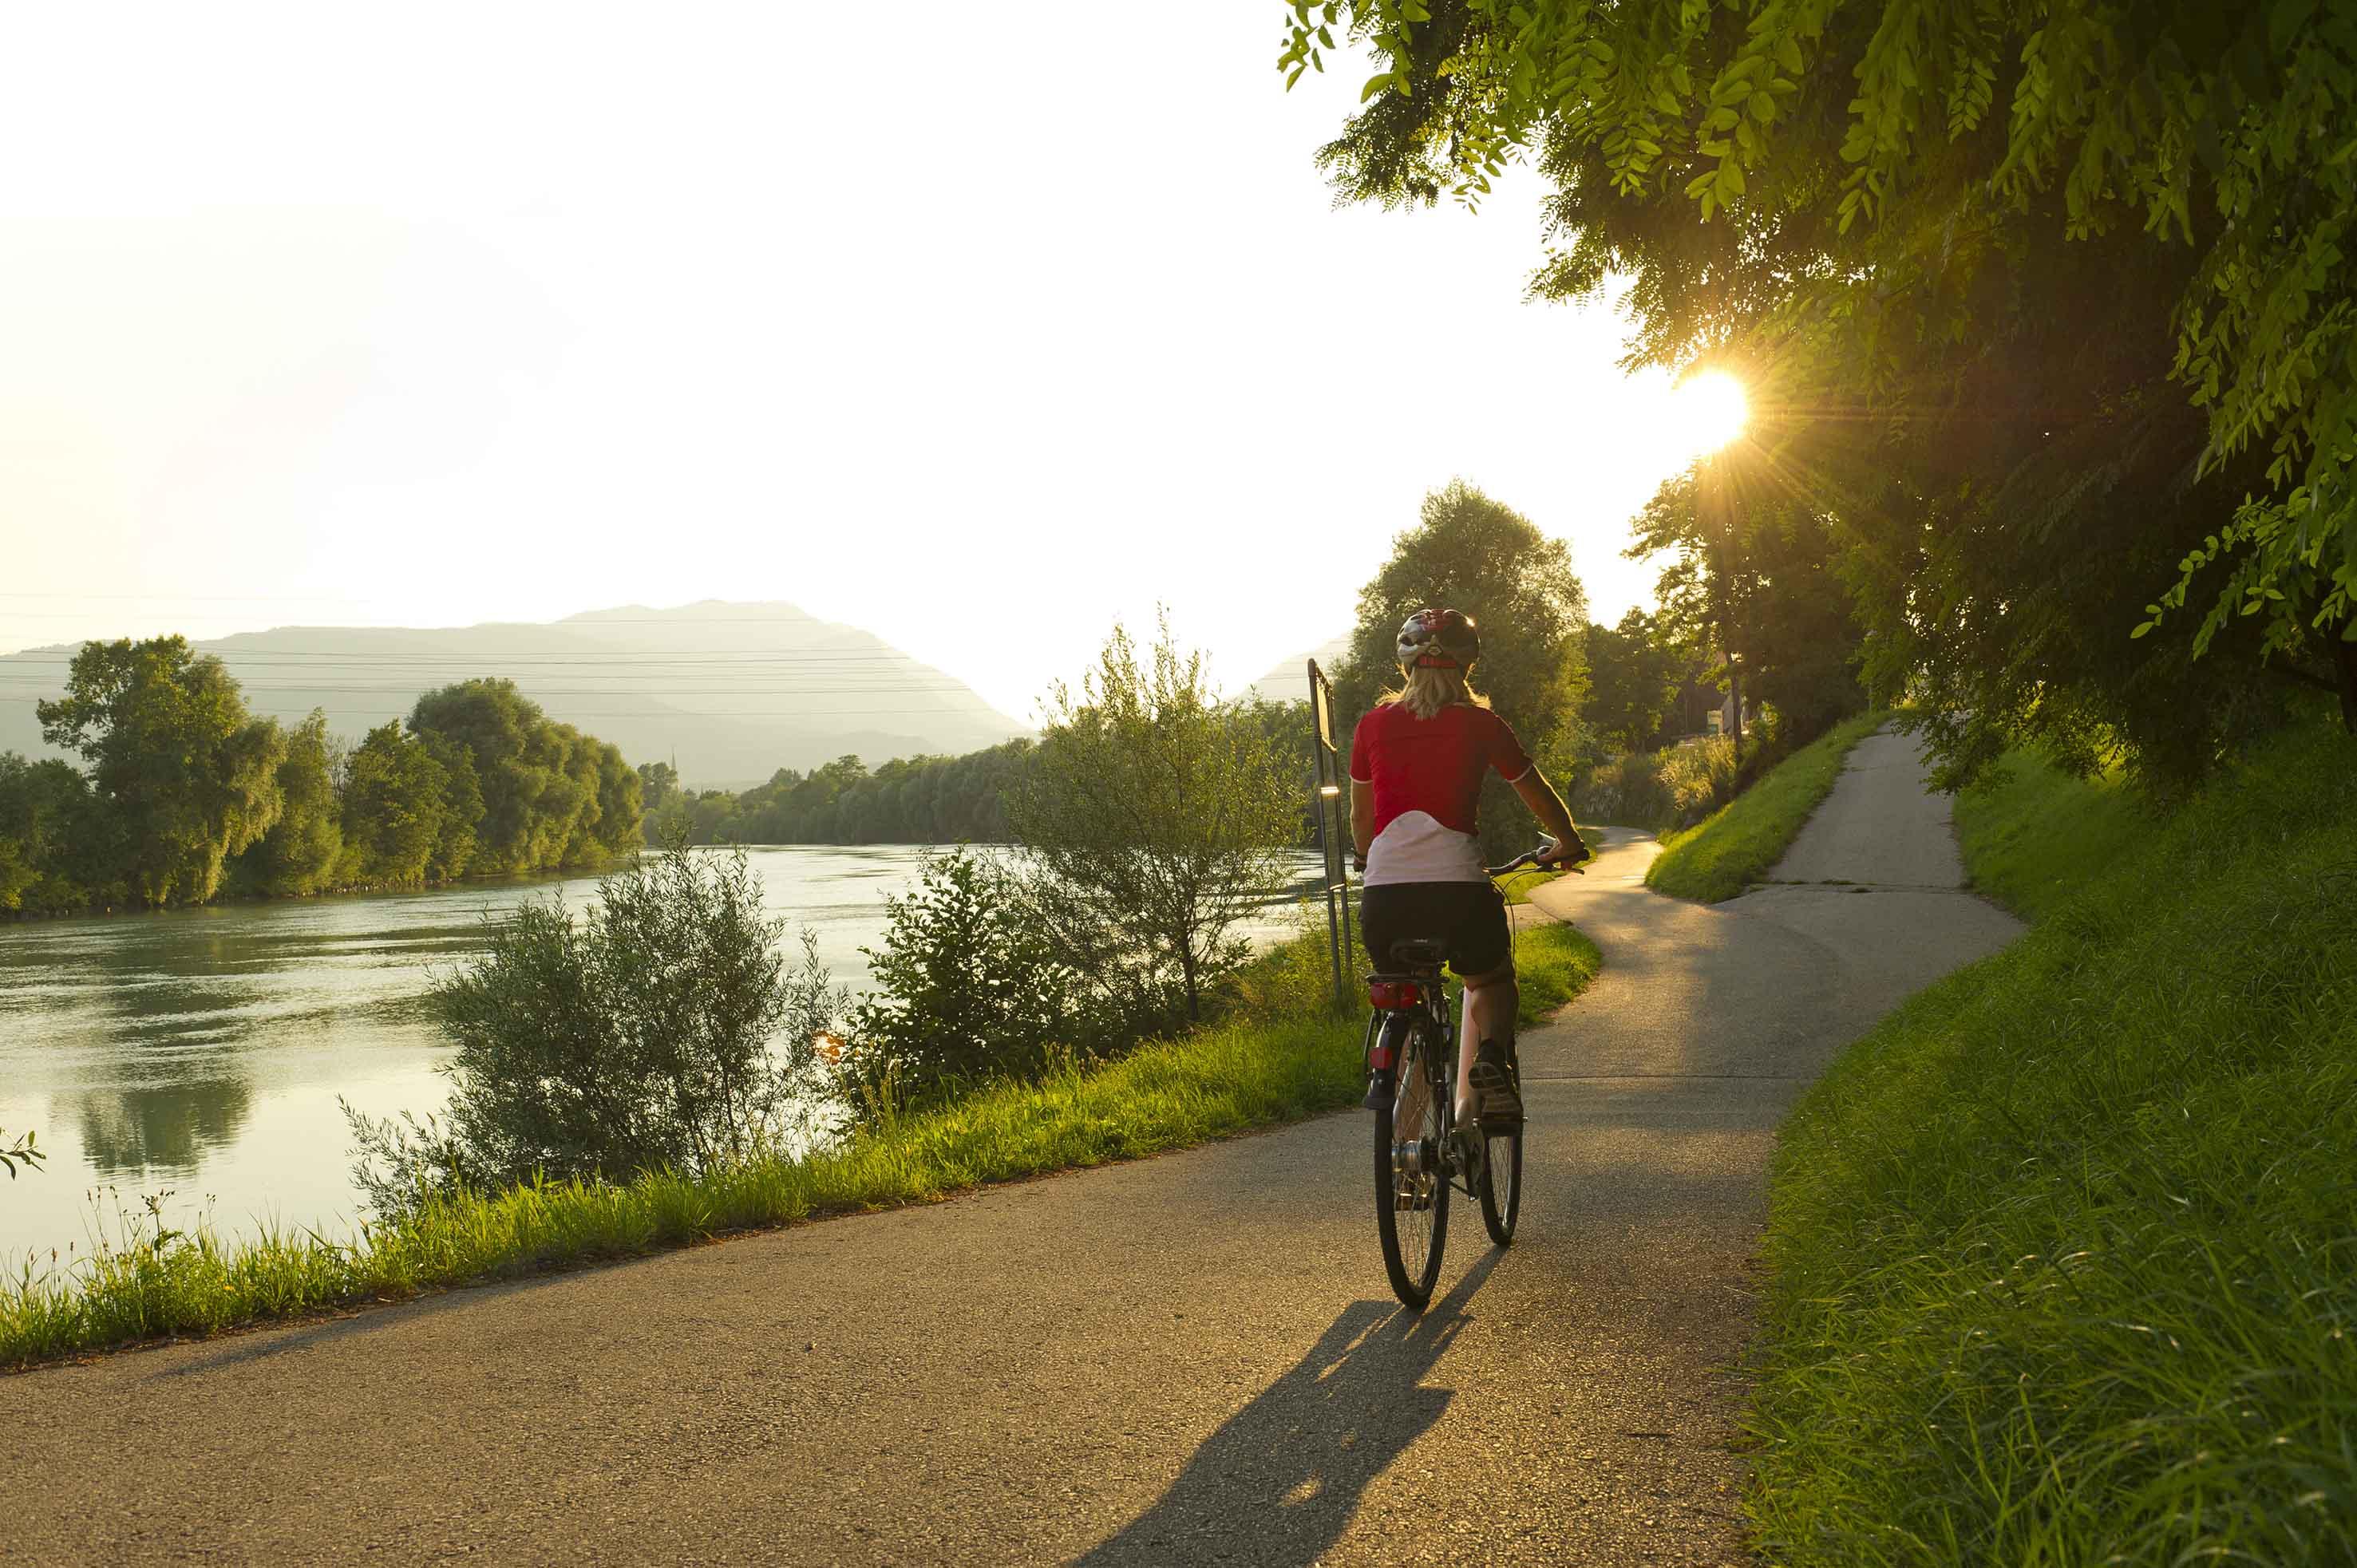 Villach, vacanze in bicicletta